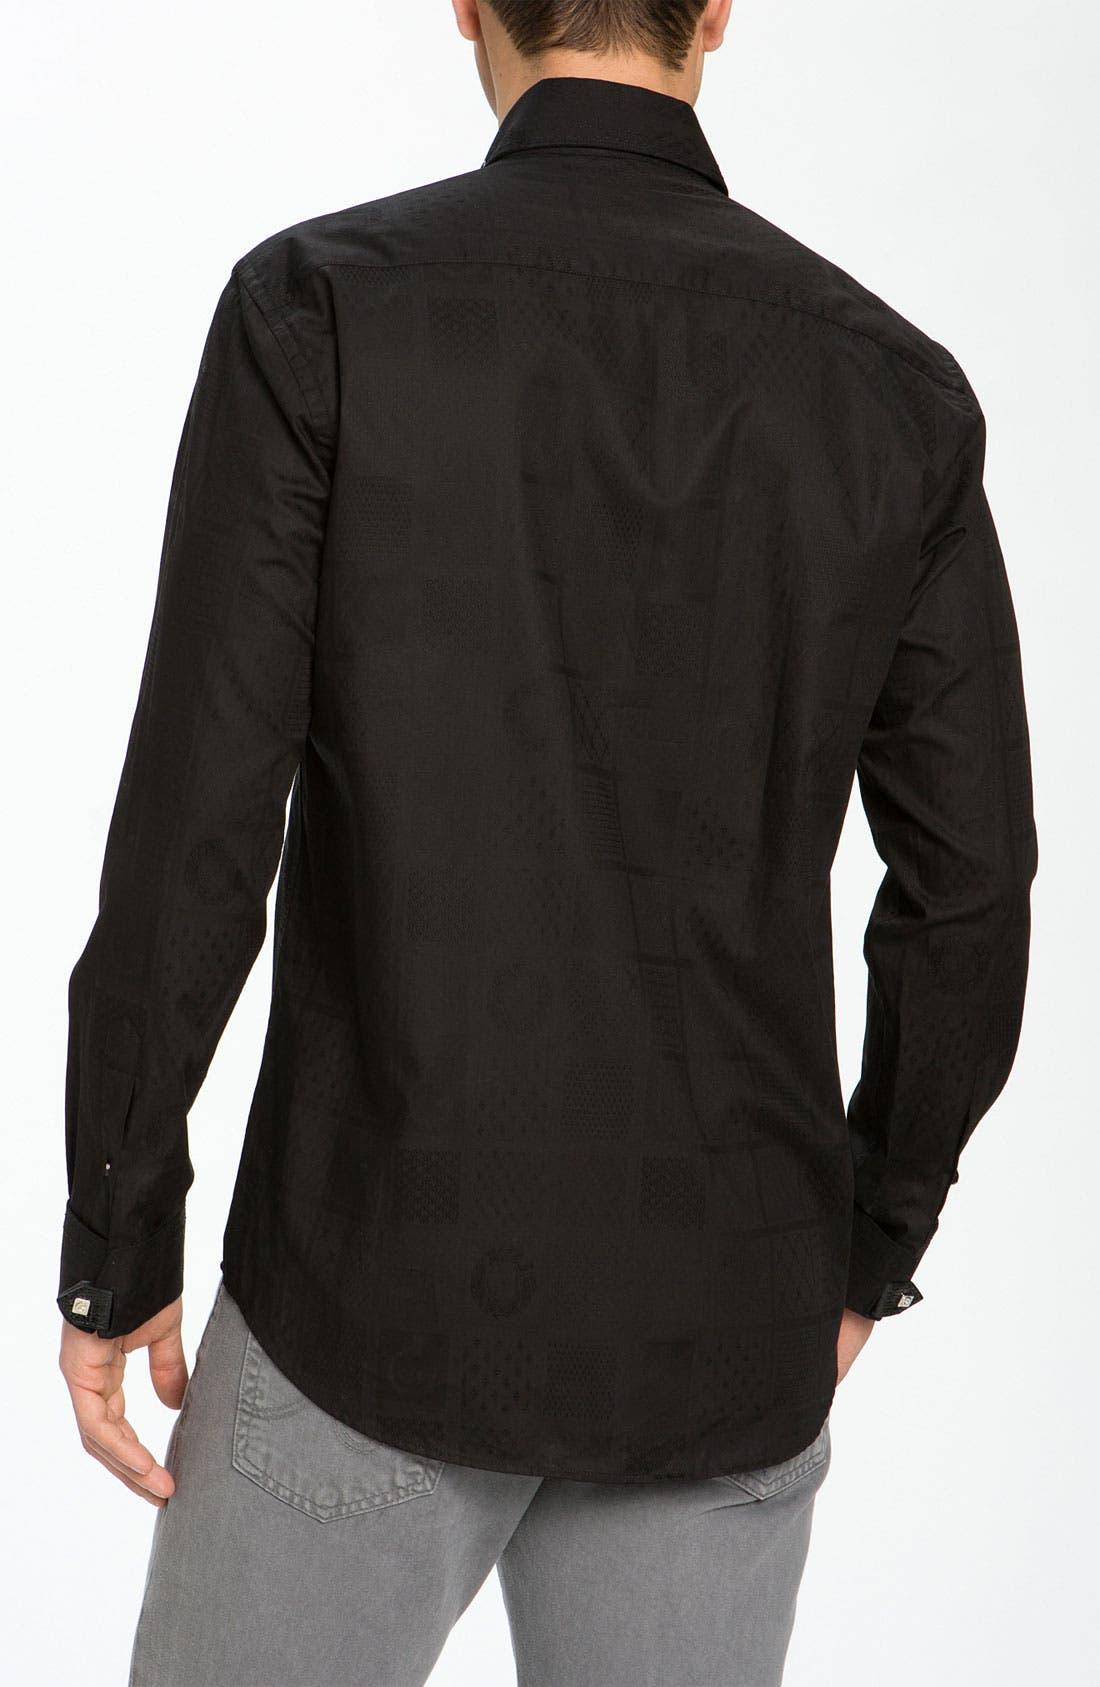 Alternate Image 3  - Bogosse 'Matis' Jacquard Sport Shirt